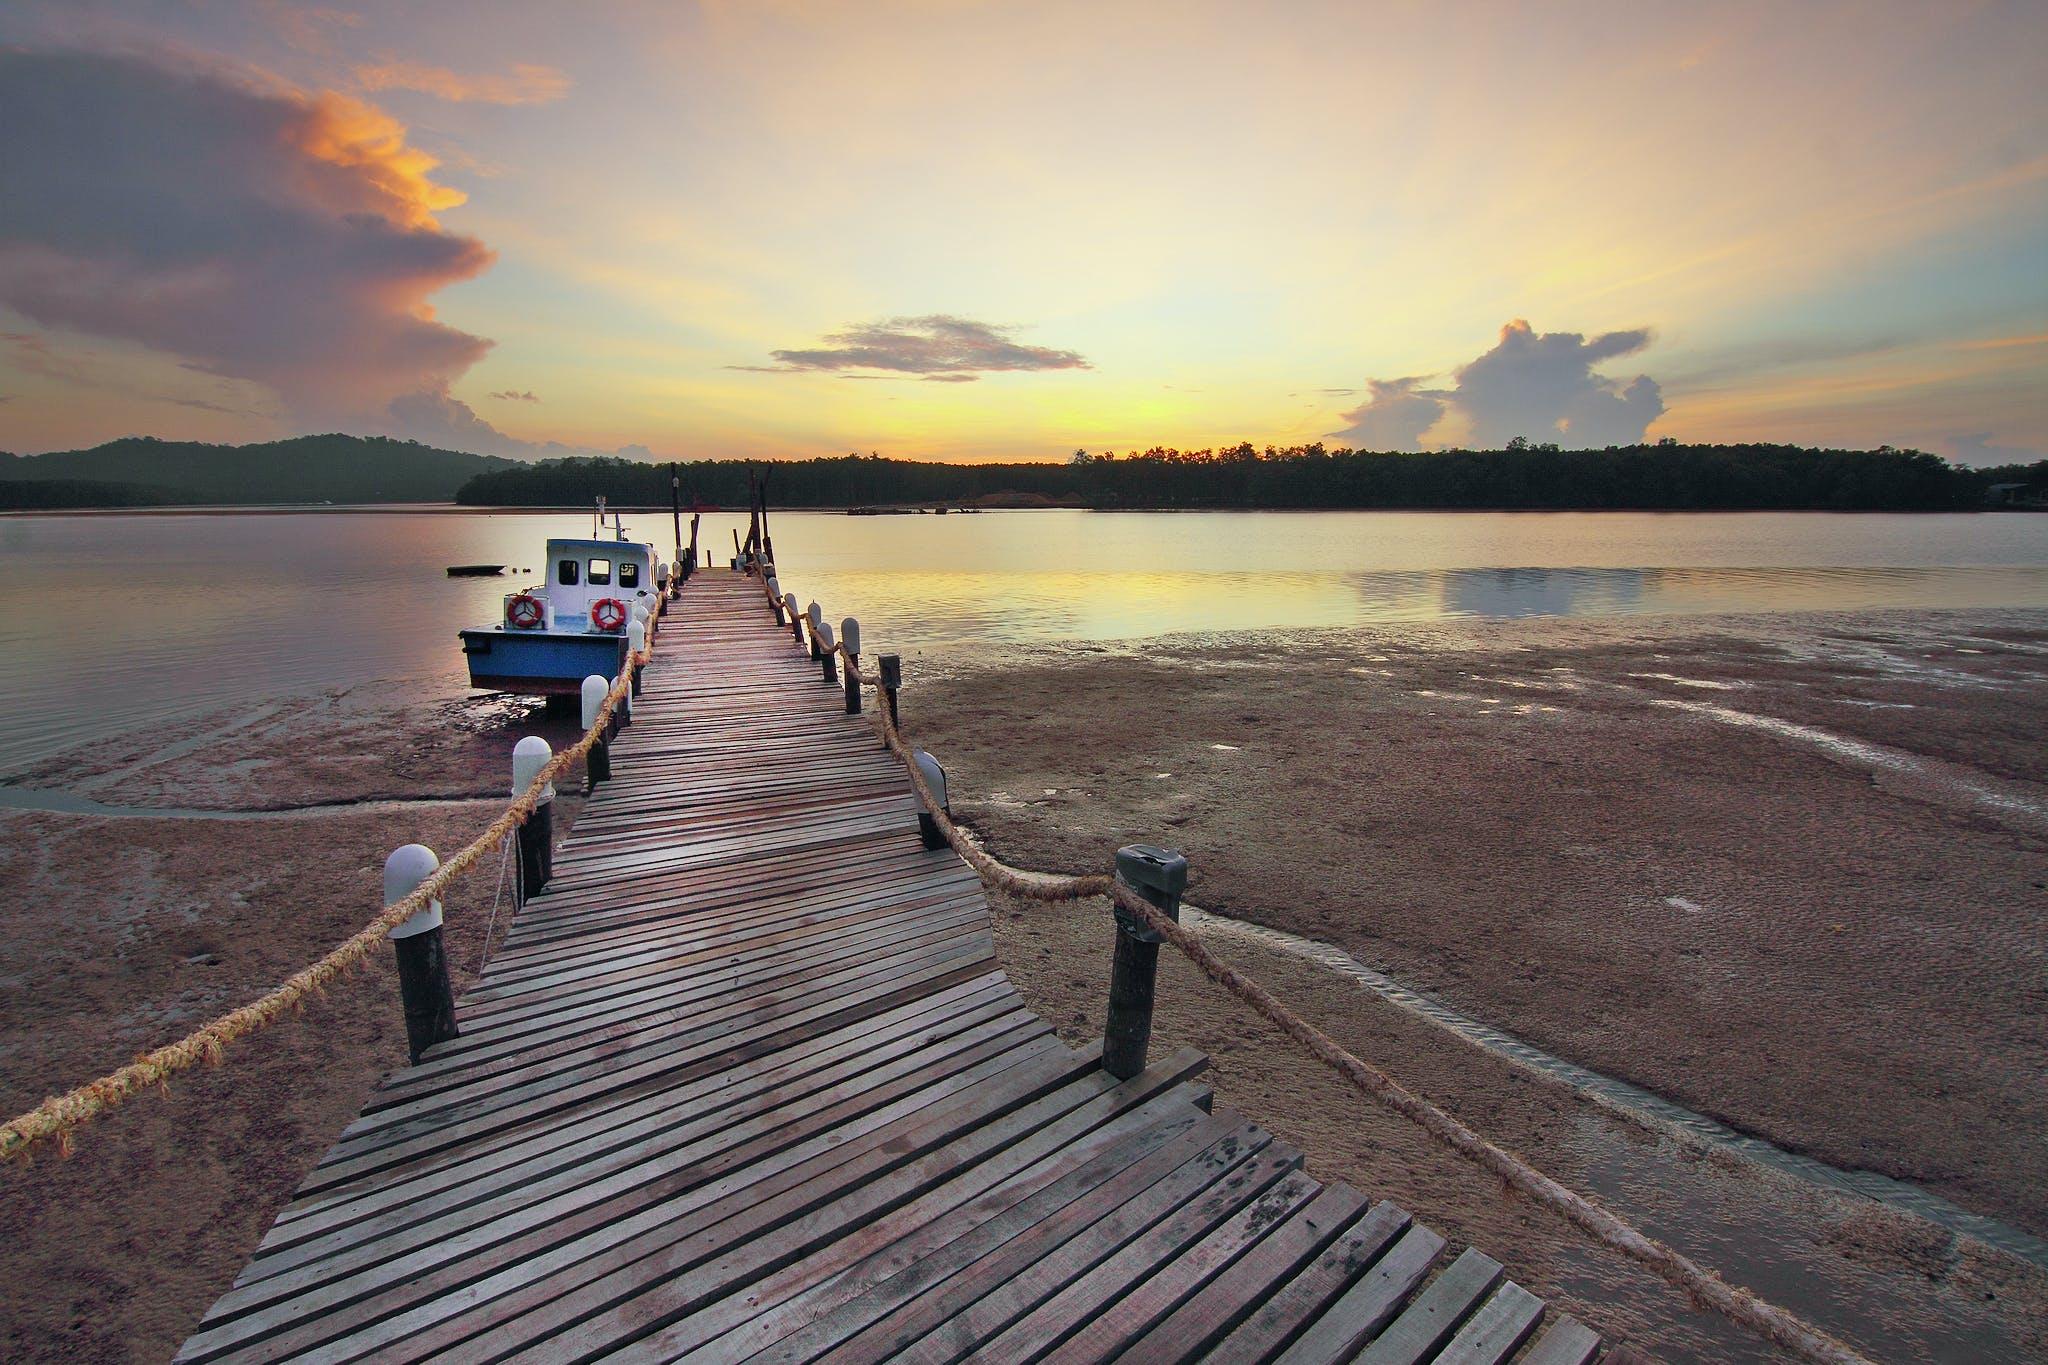 boat, clouds, dock